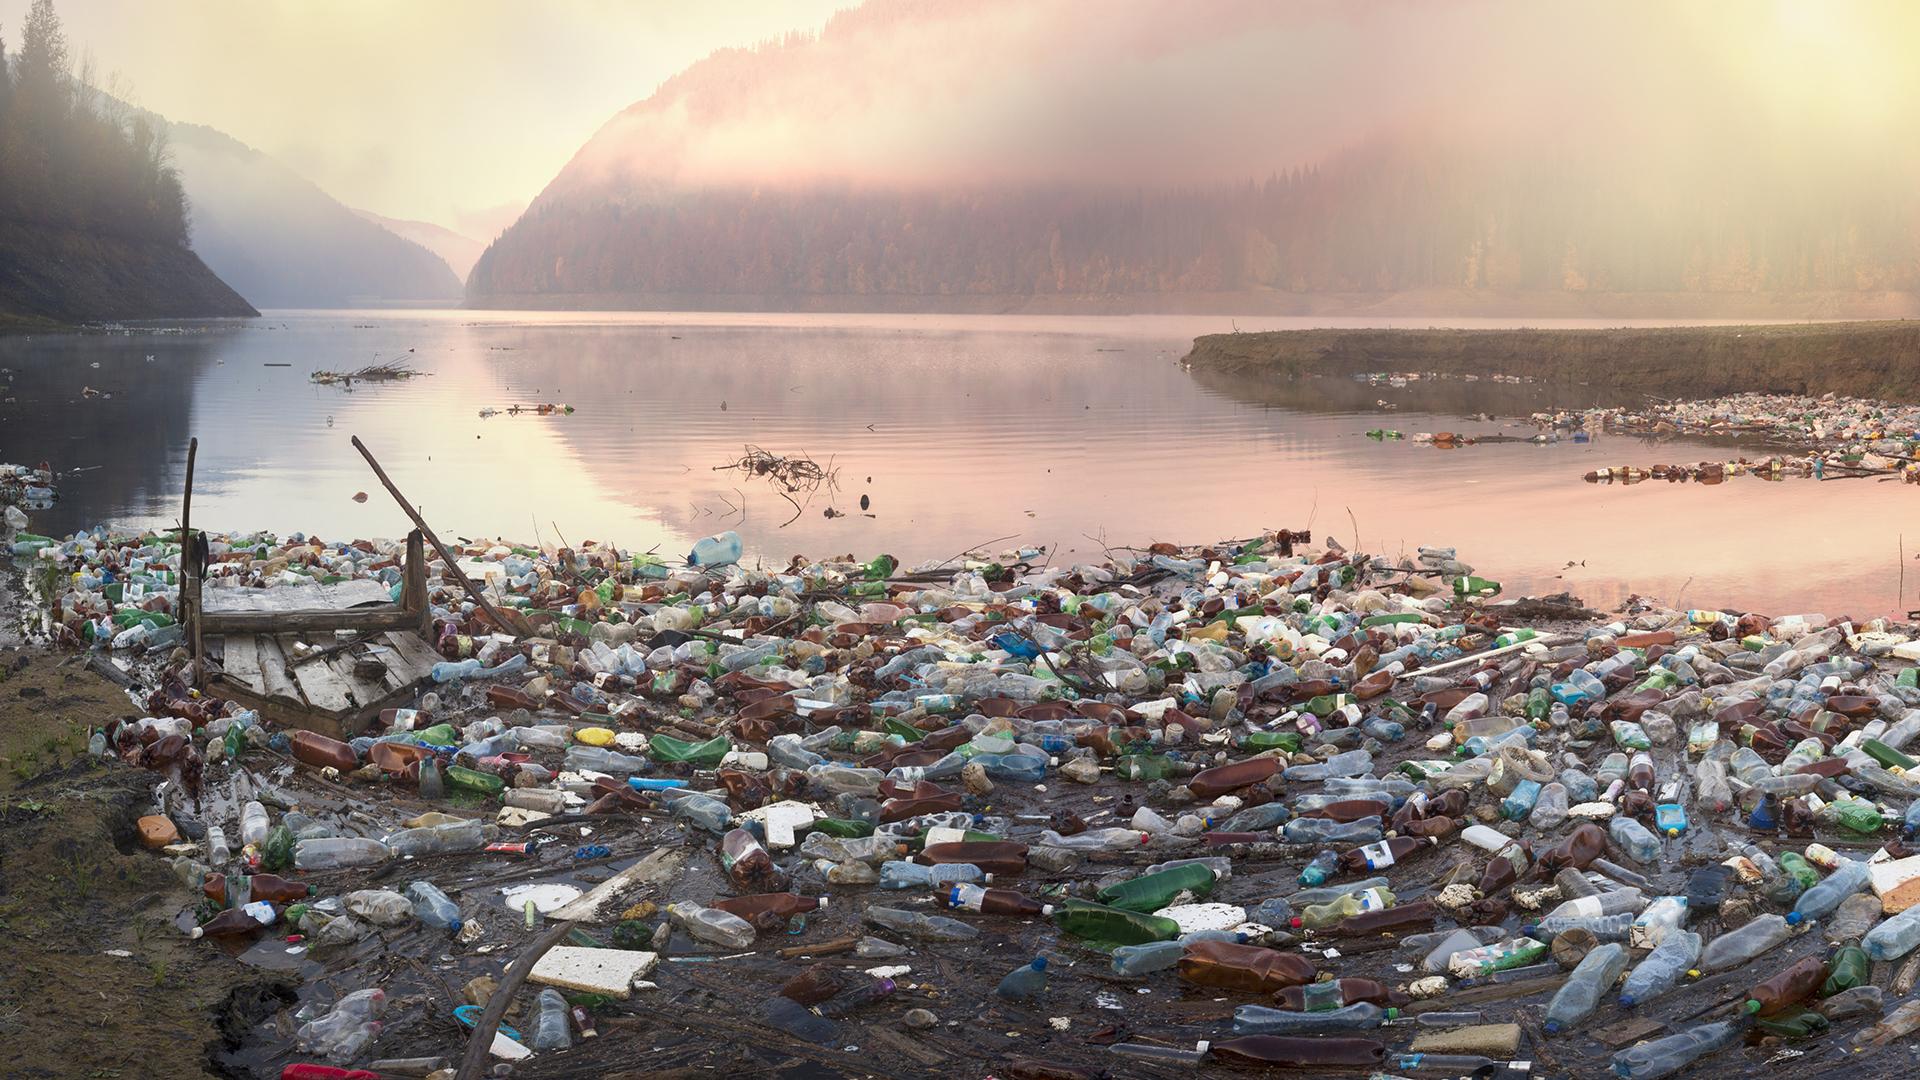 Plastic debris on beach